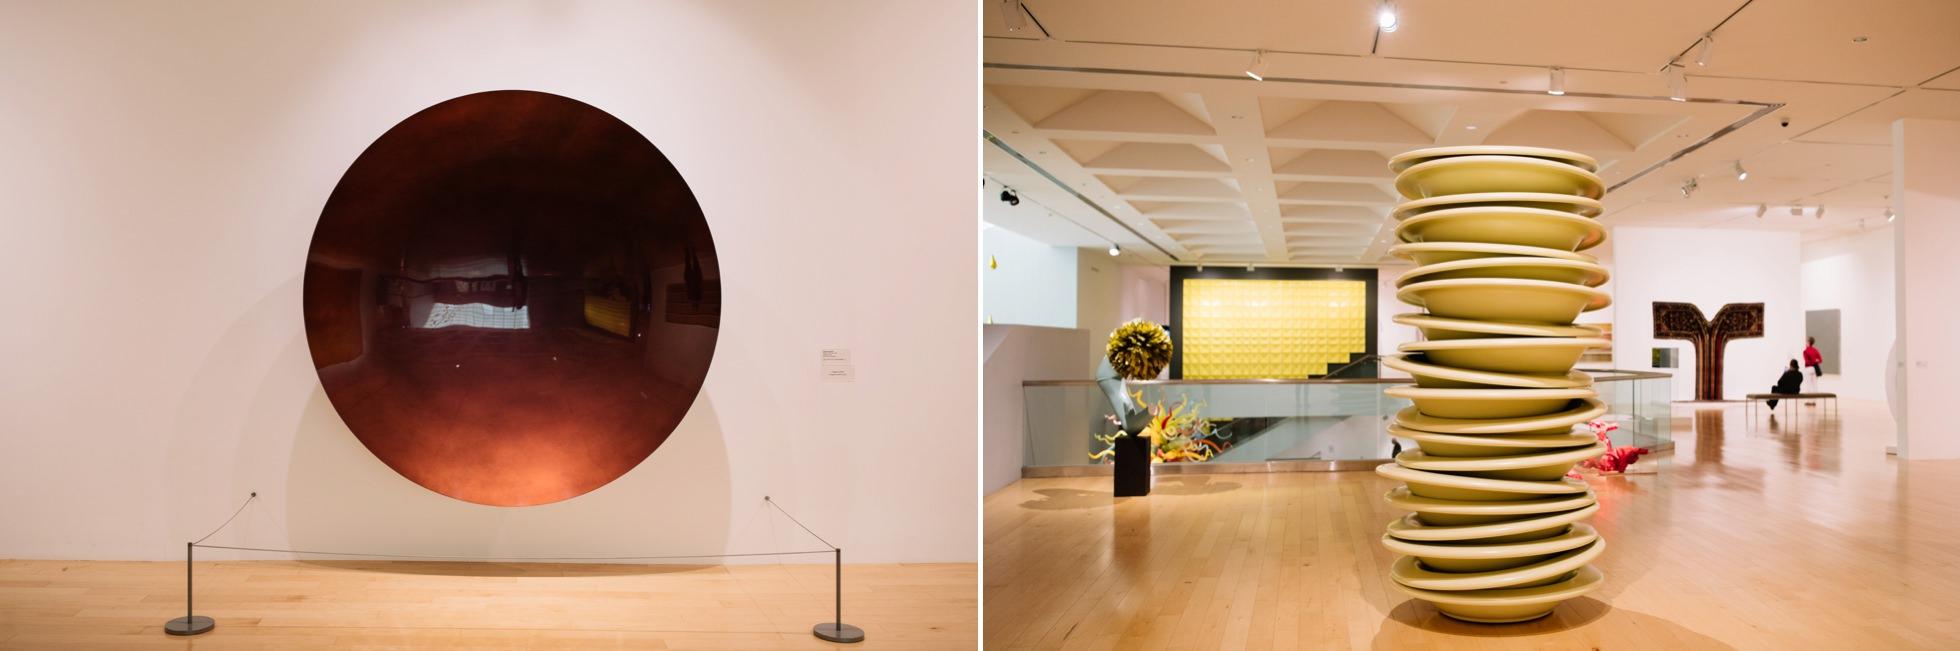 0055-palm-springs-art-museum-modern-art-photography-interior